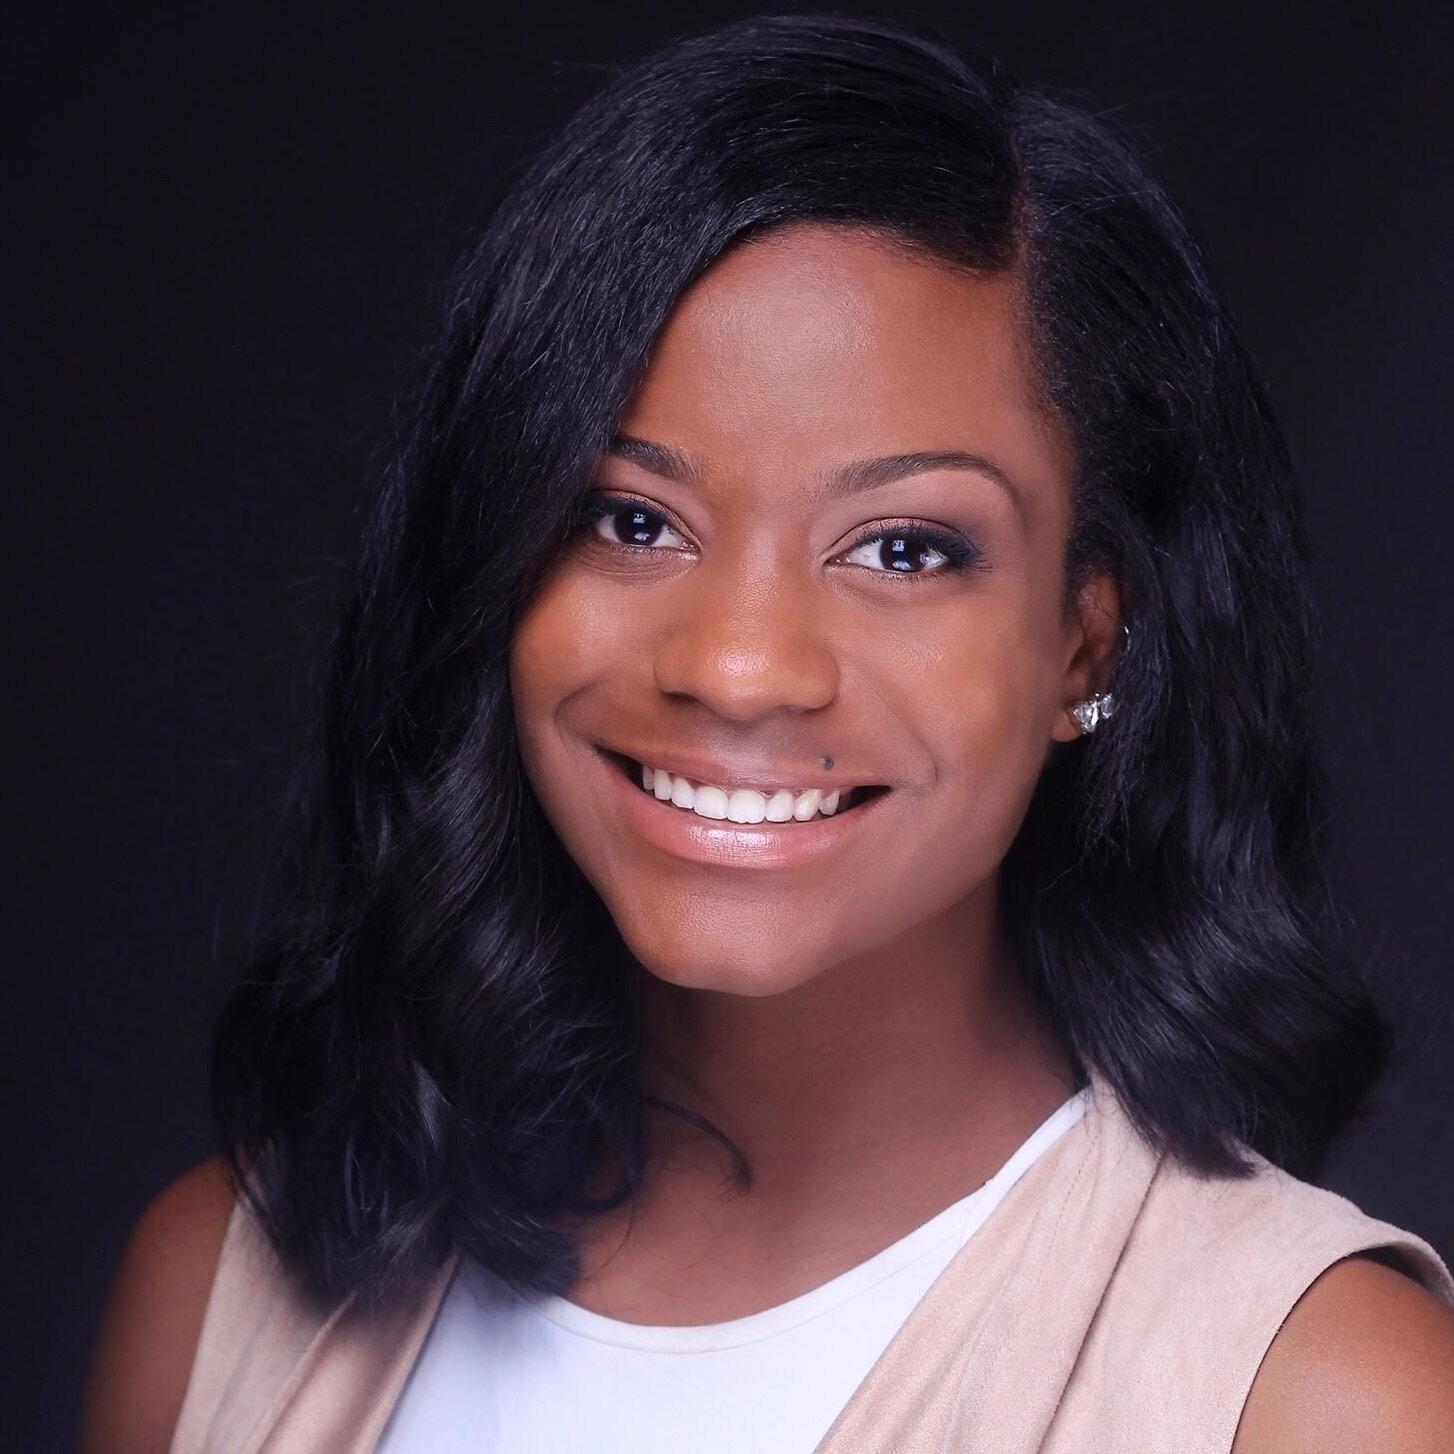 Taryn Johnson